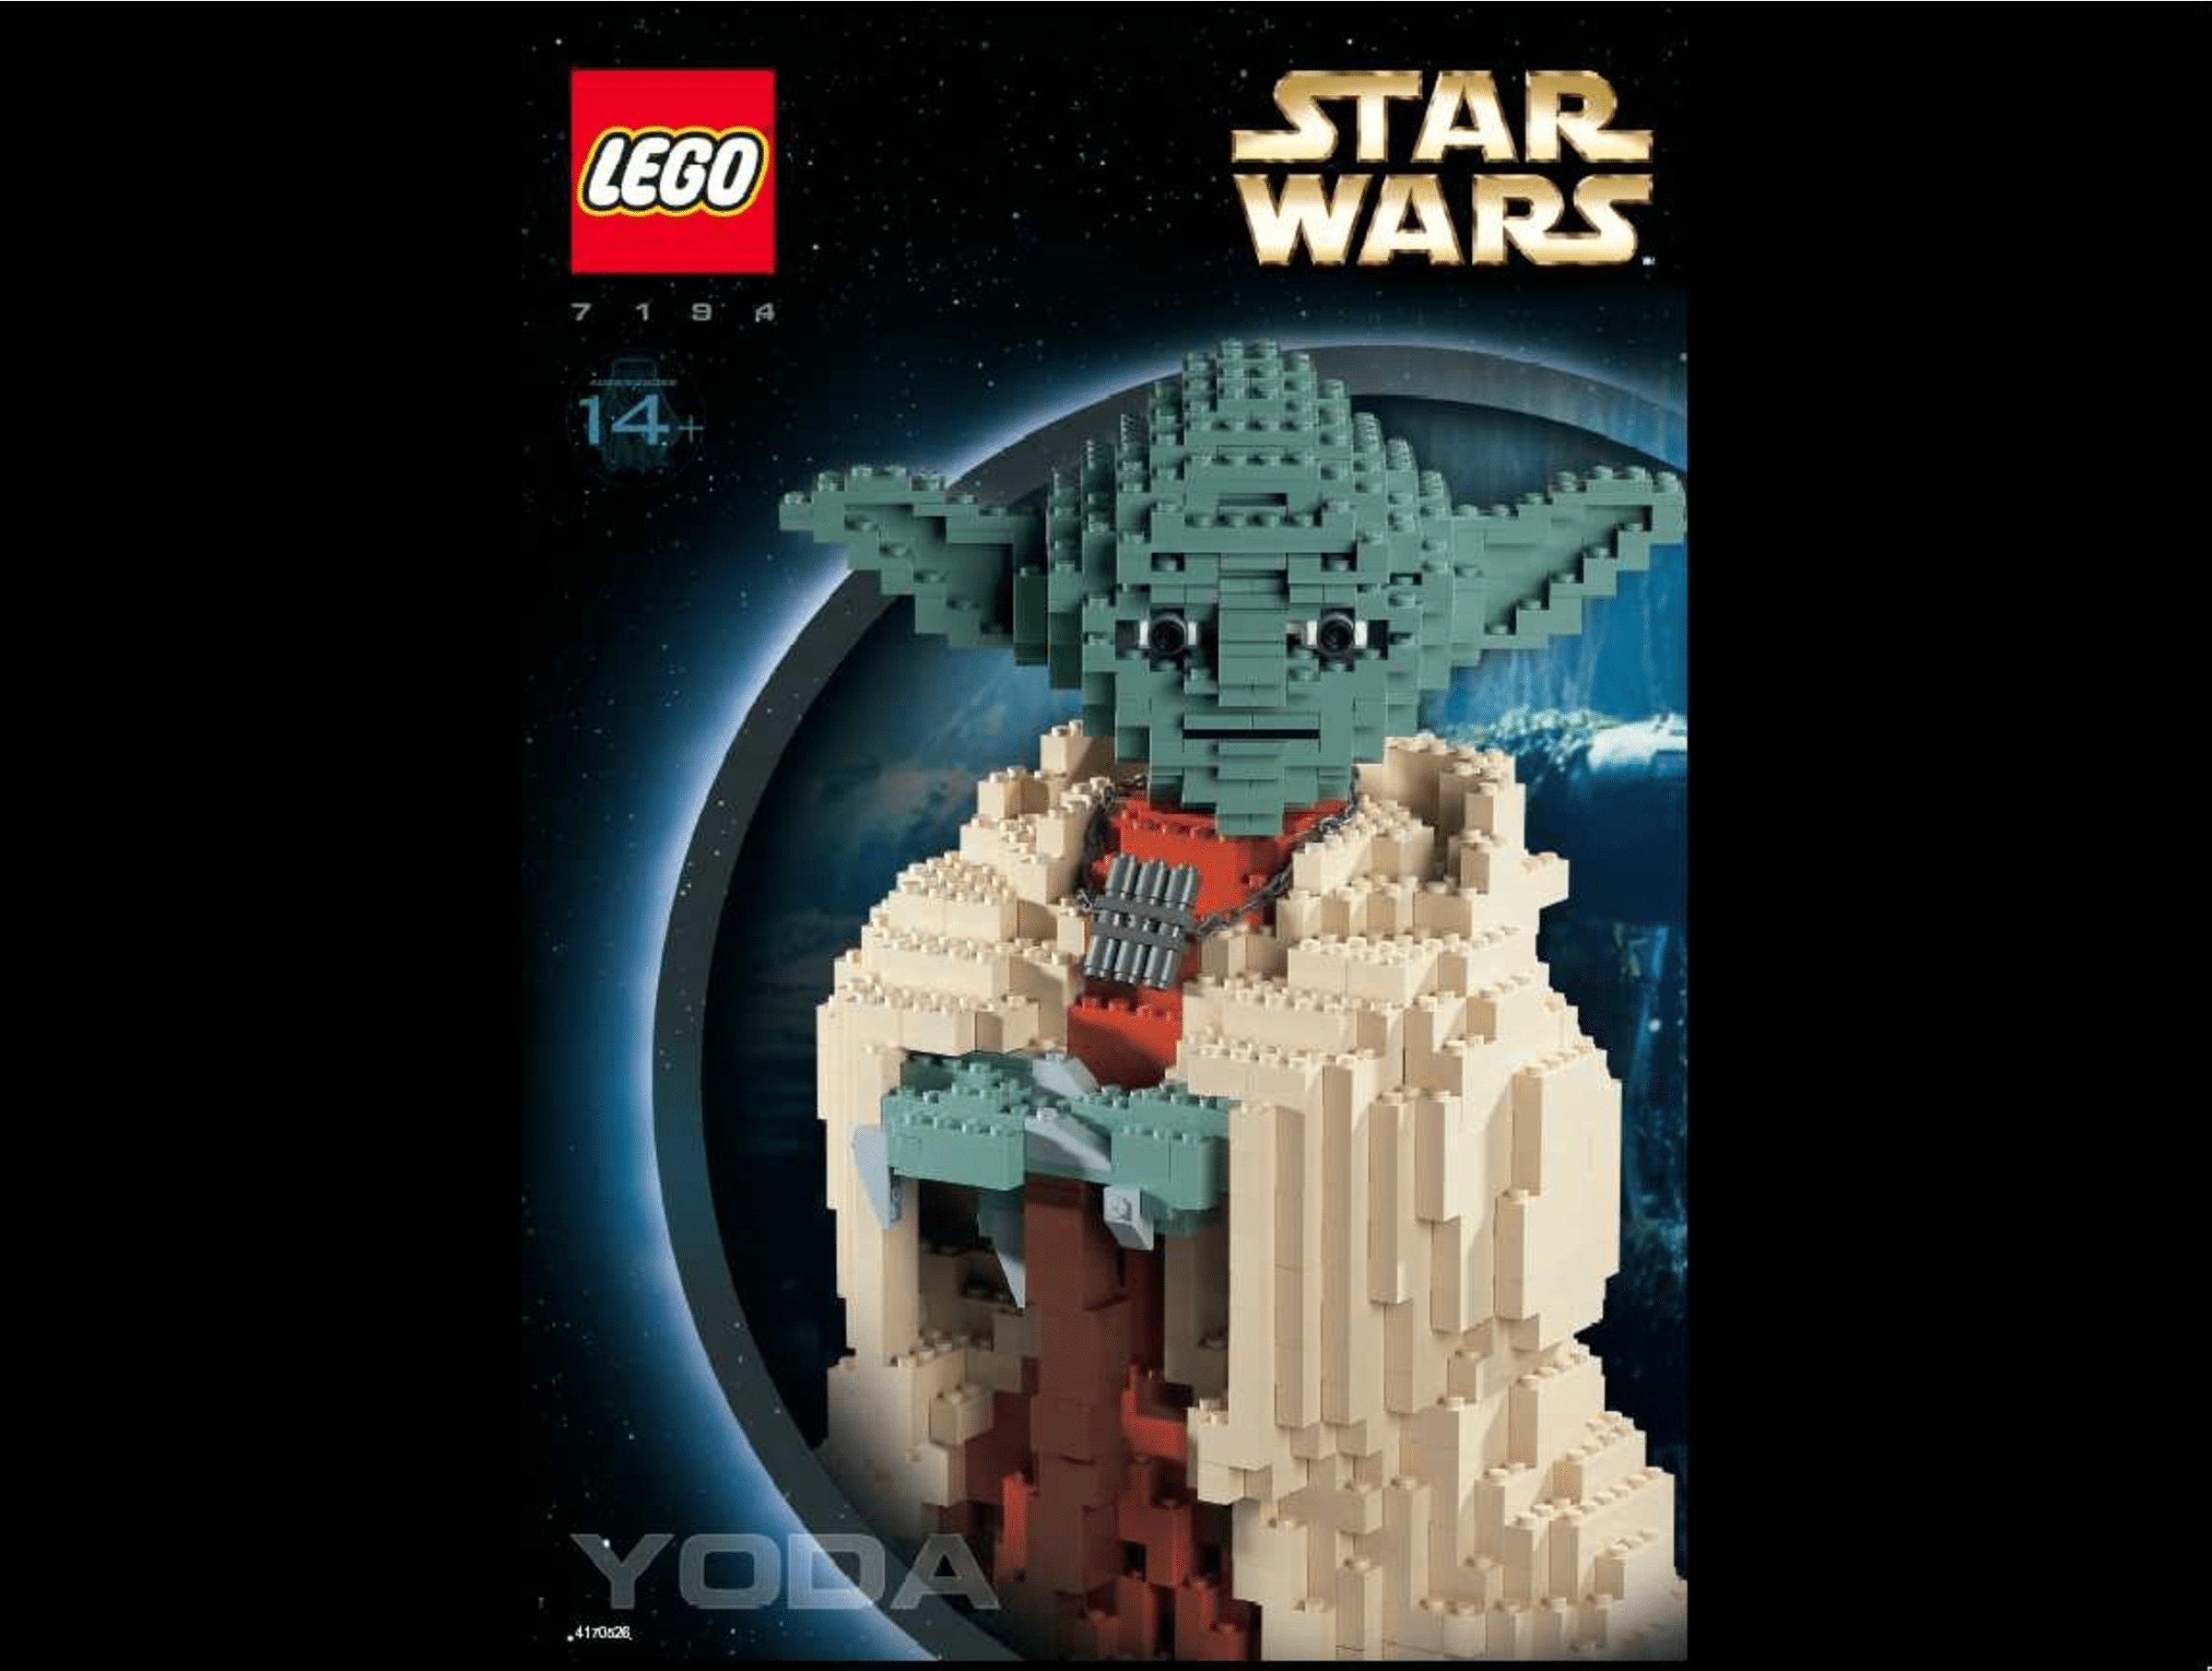 L'incroyable tournant Geek pris par Lego. #6